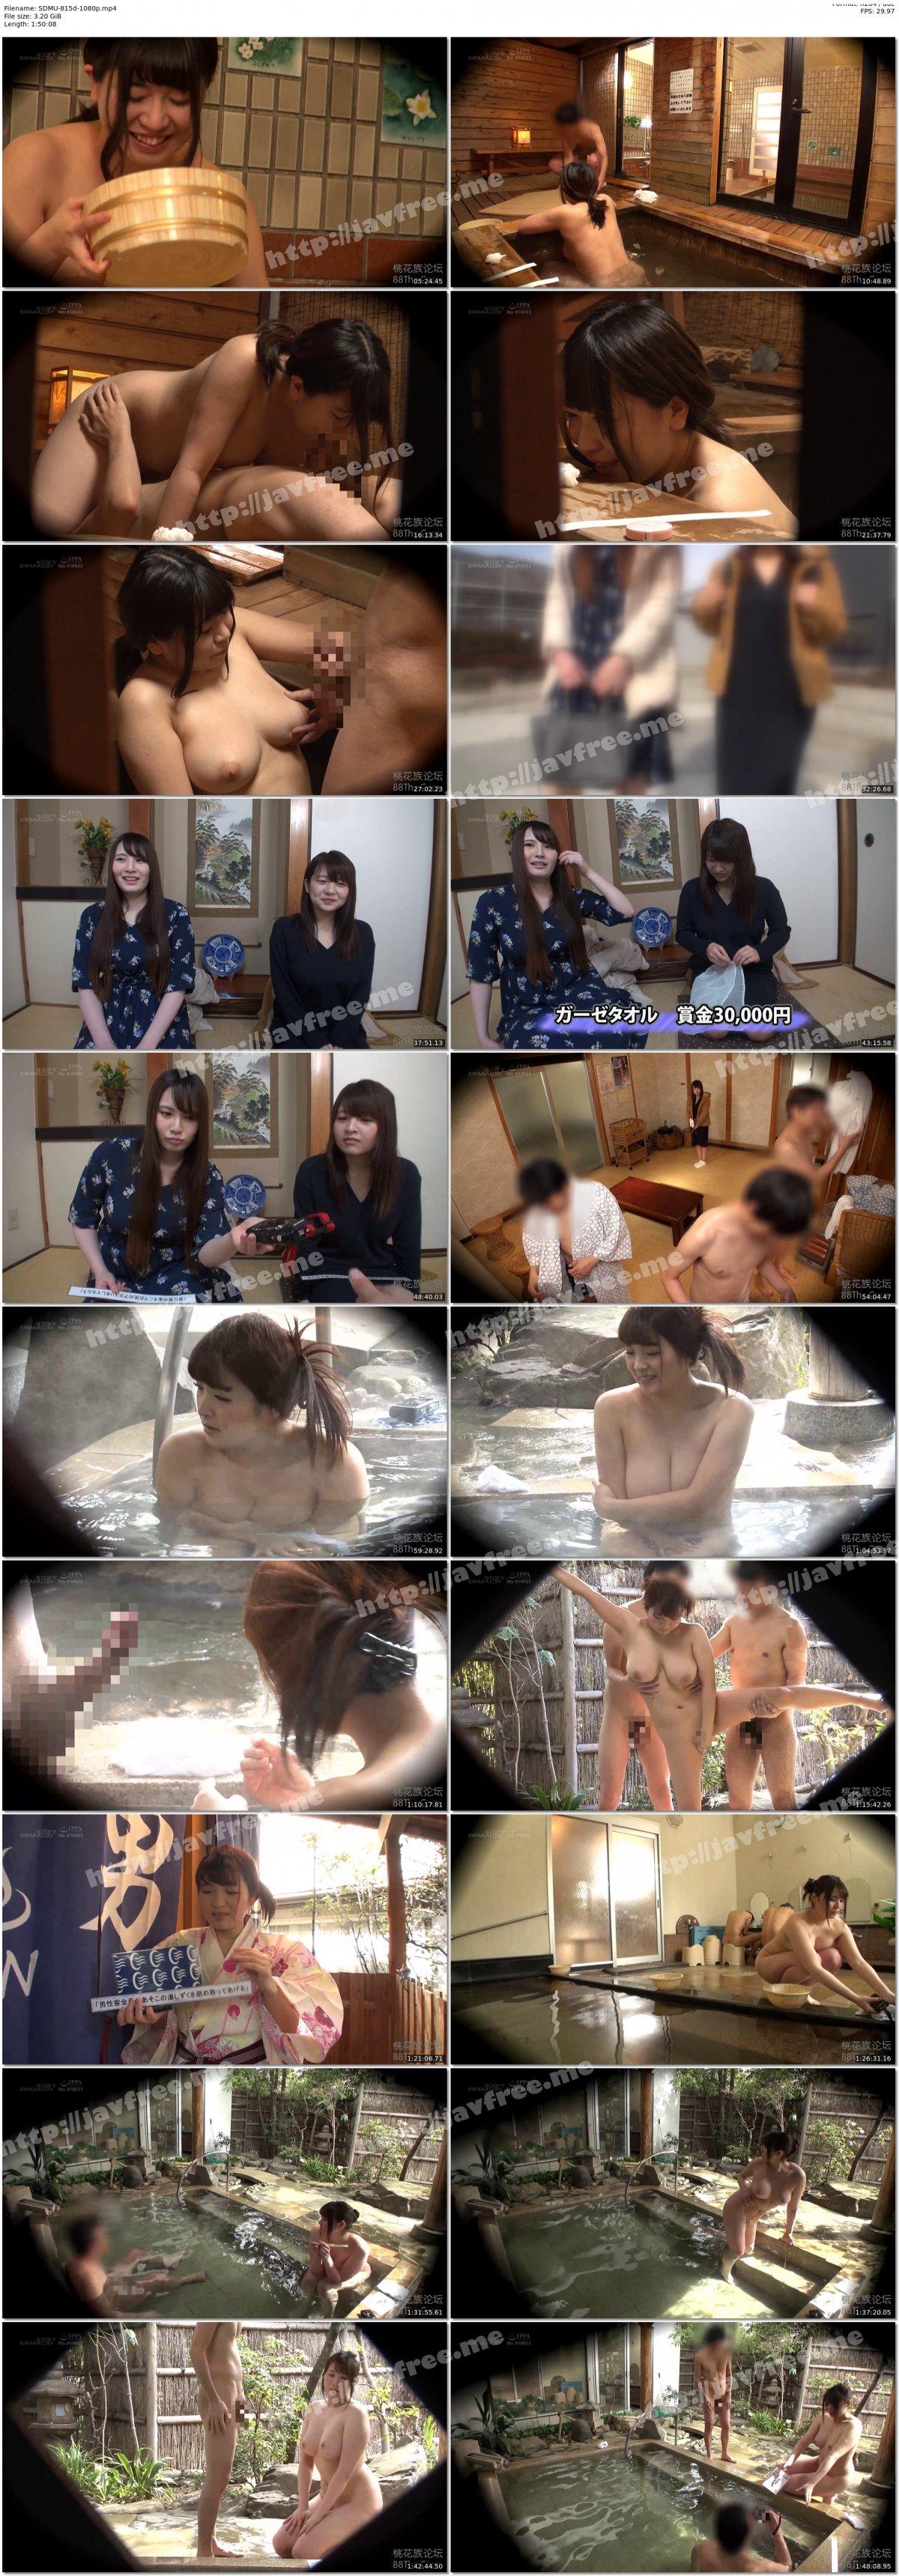 [HD][SDMU-815] 石和温泉で見つけた卒業旅行中の美巨乳女子学生のお嬢さん タオル一枚 男湯入ってみませんか?+過激すぎて未公開だった(秘)映像を一挙大公開 40回記念 12名2枚組8時間SP